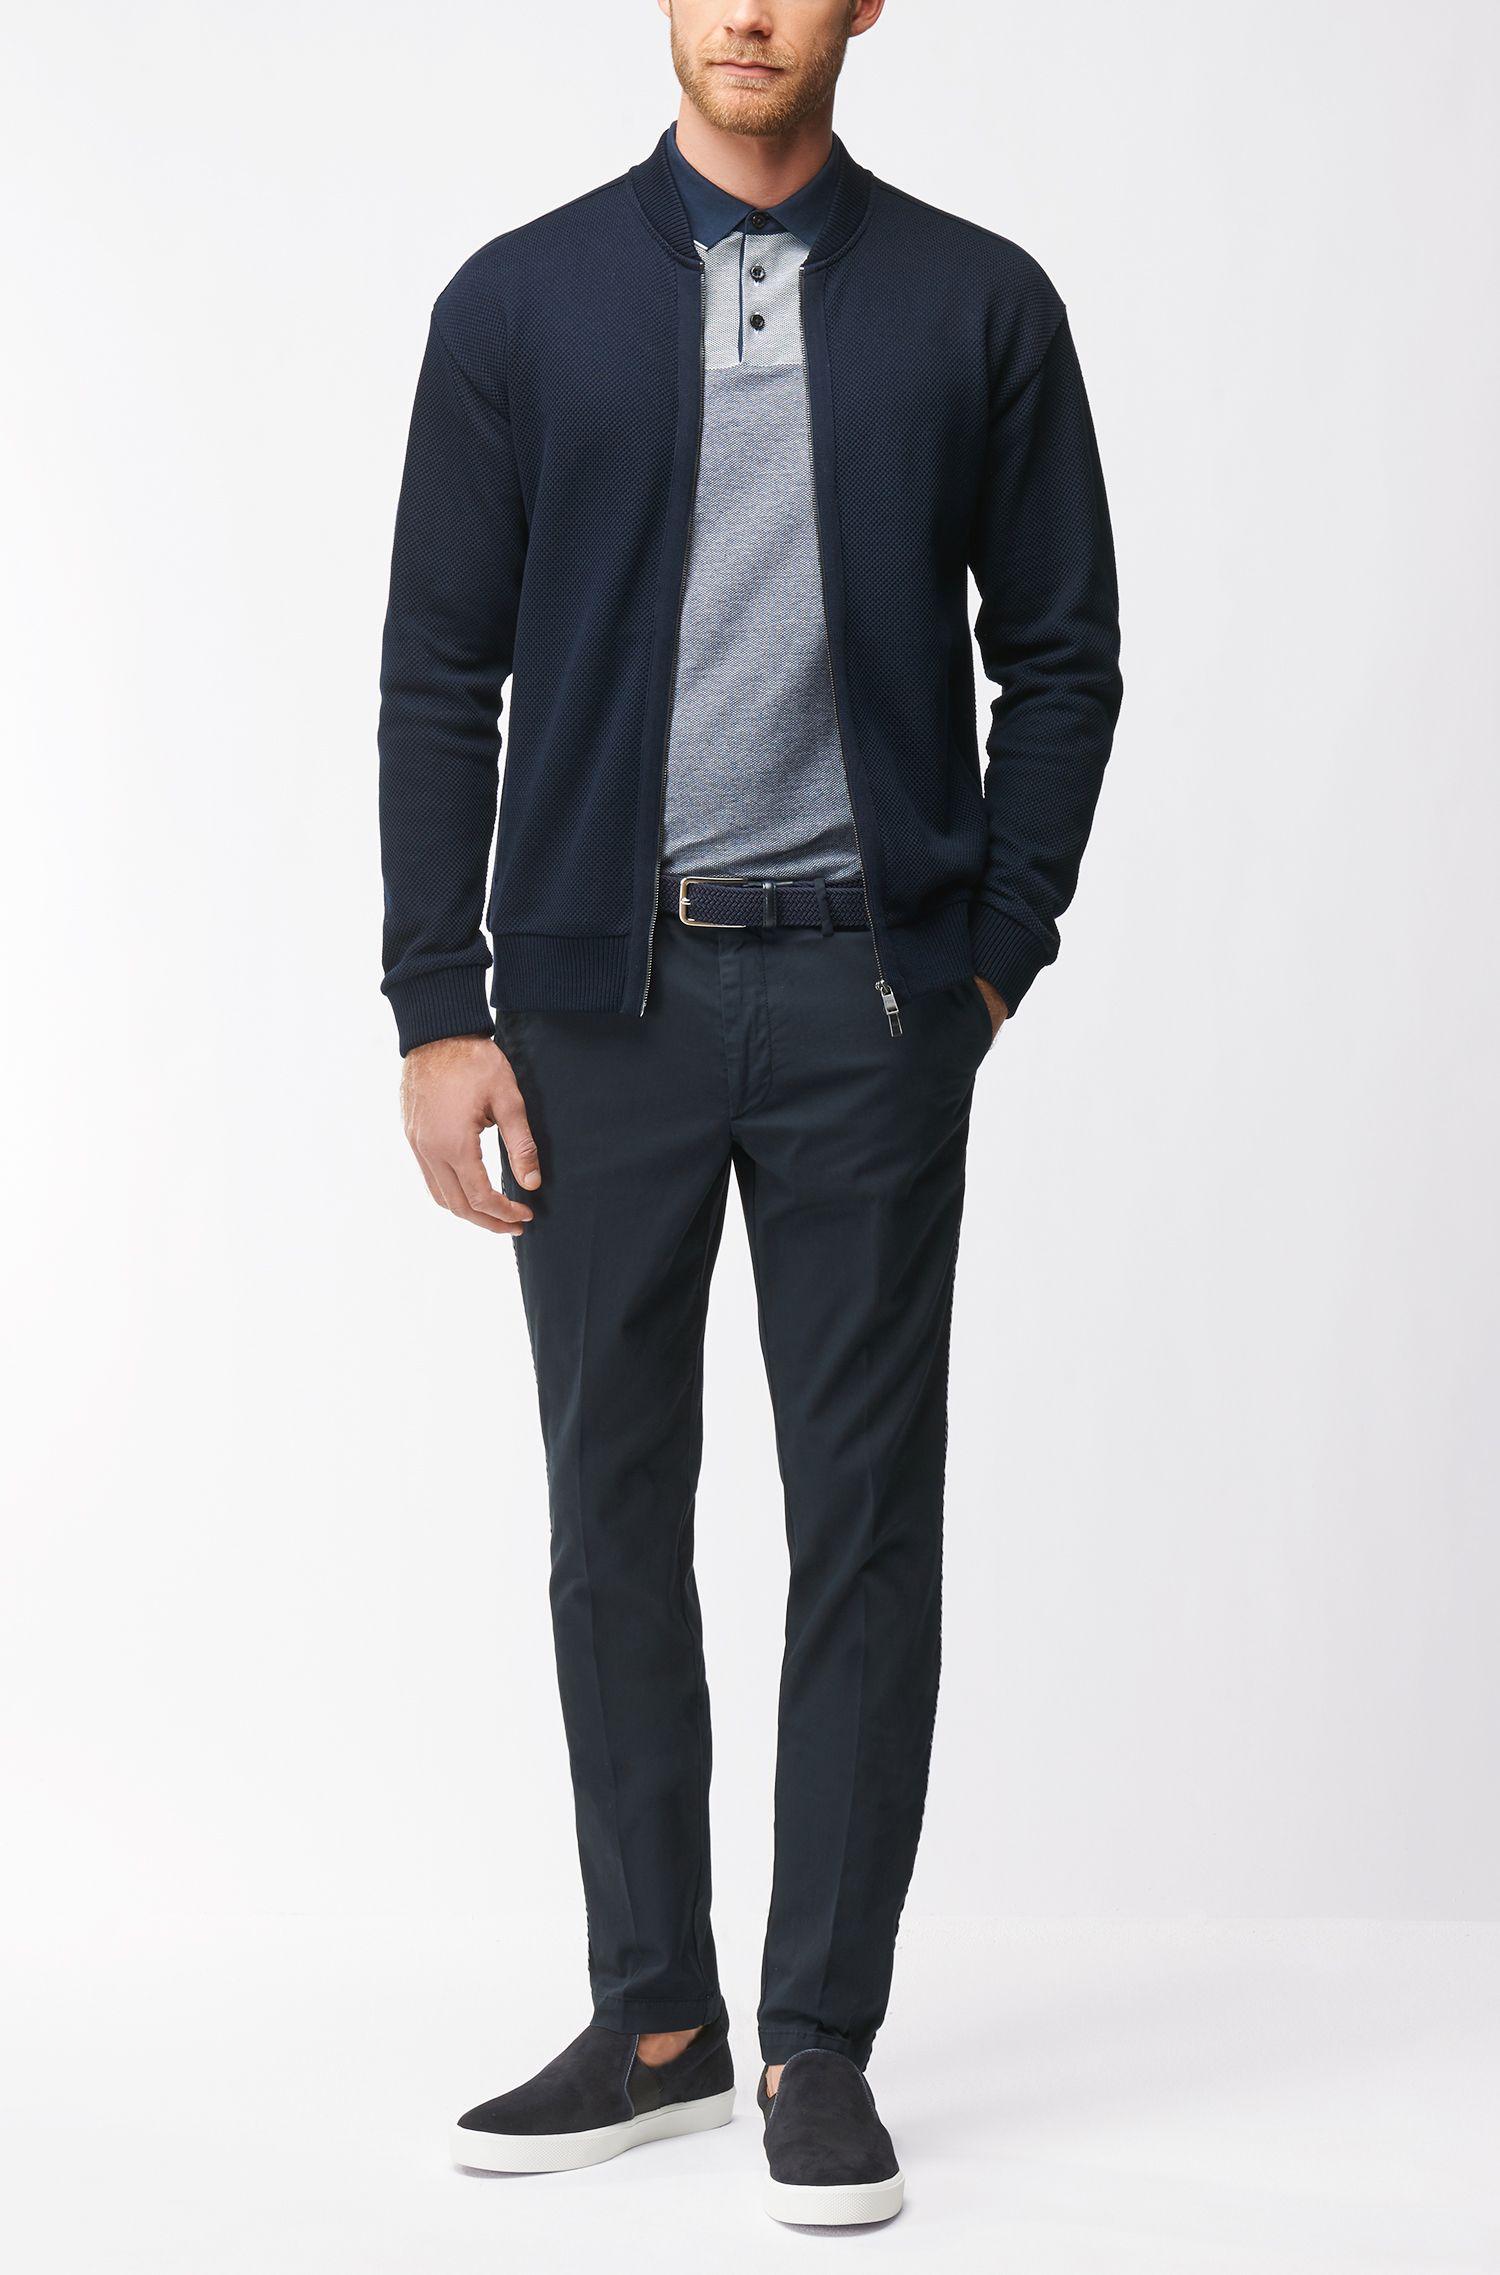 Mercerized Cotton Knit Polo Shirt, Regular Fit | Pack